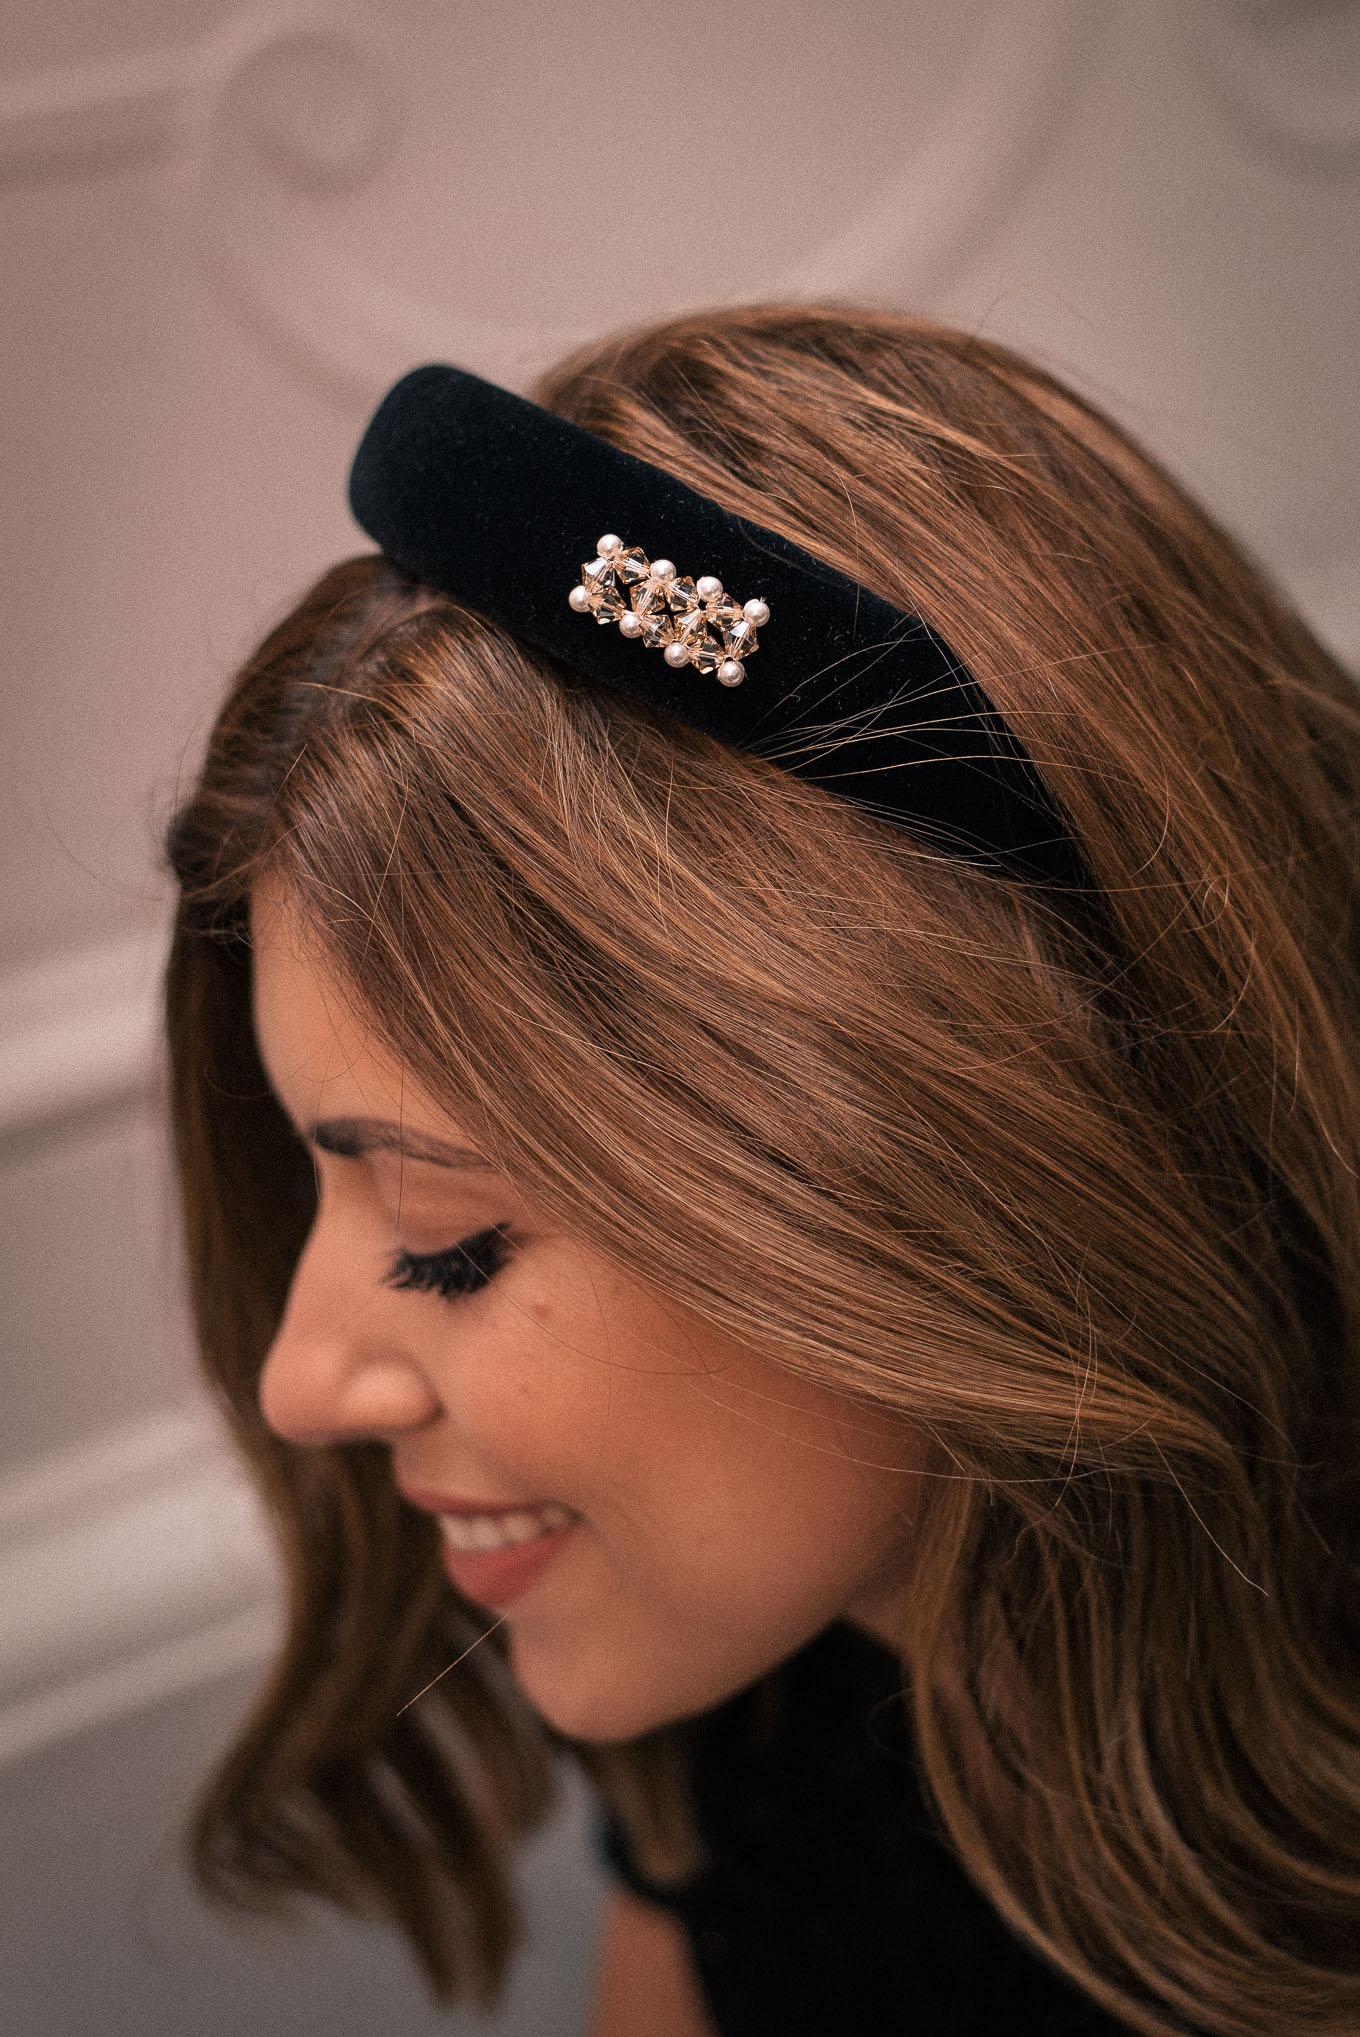 Headband with Swarovski